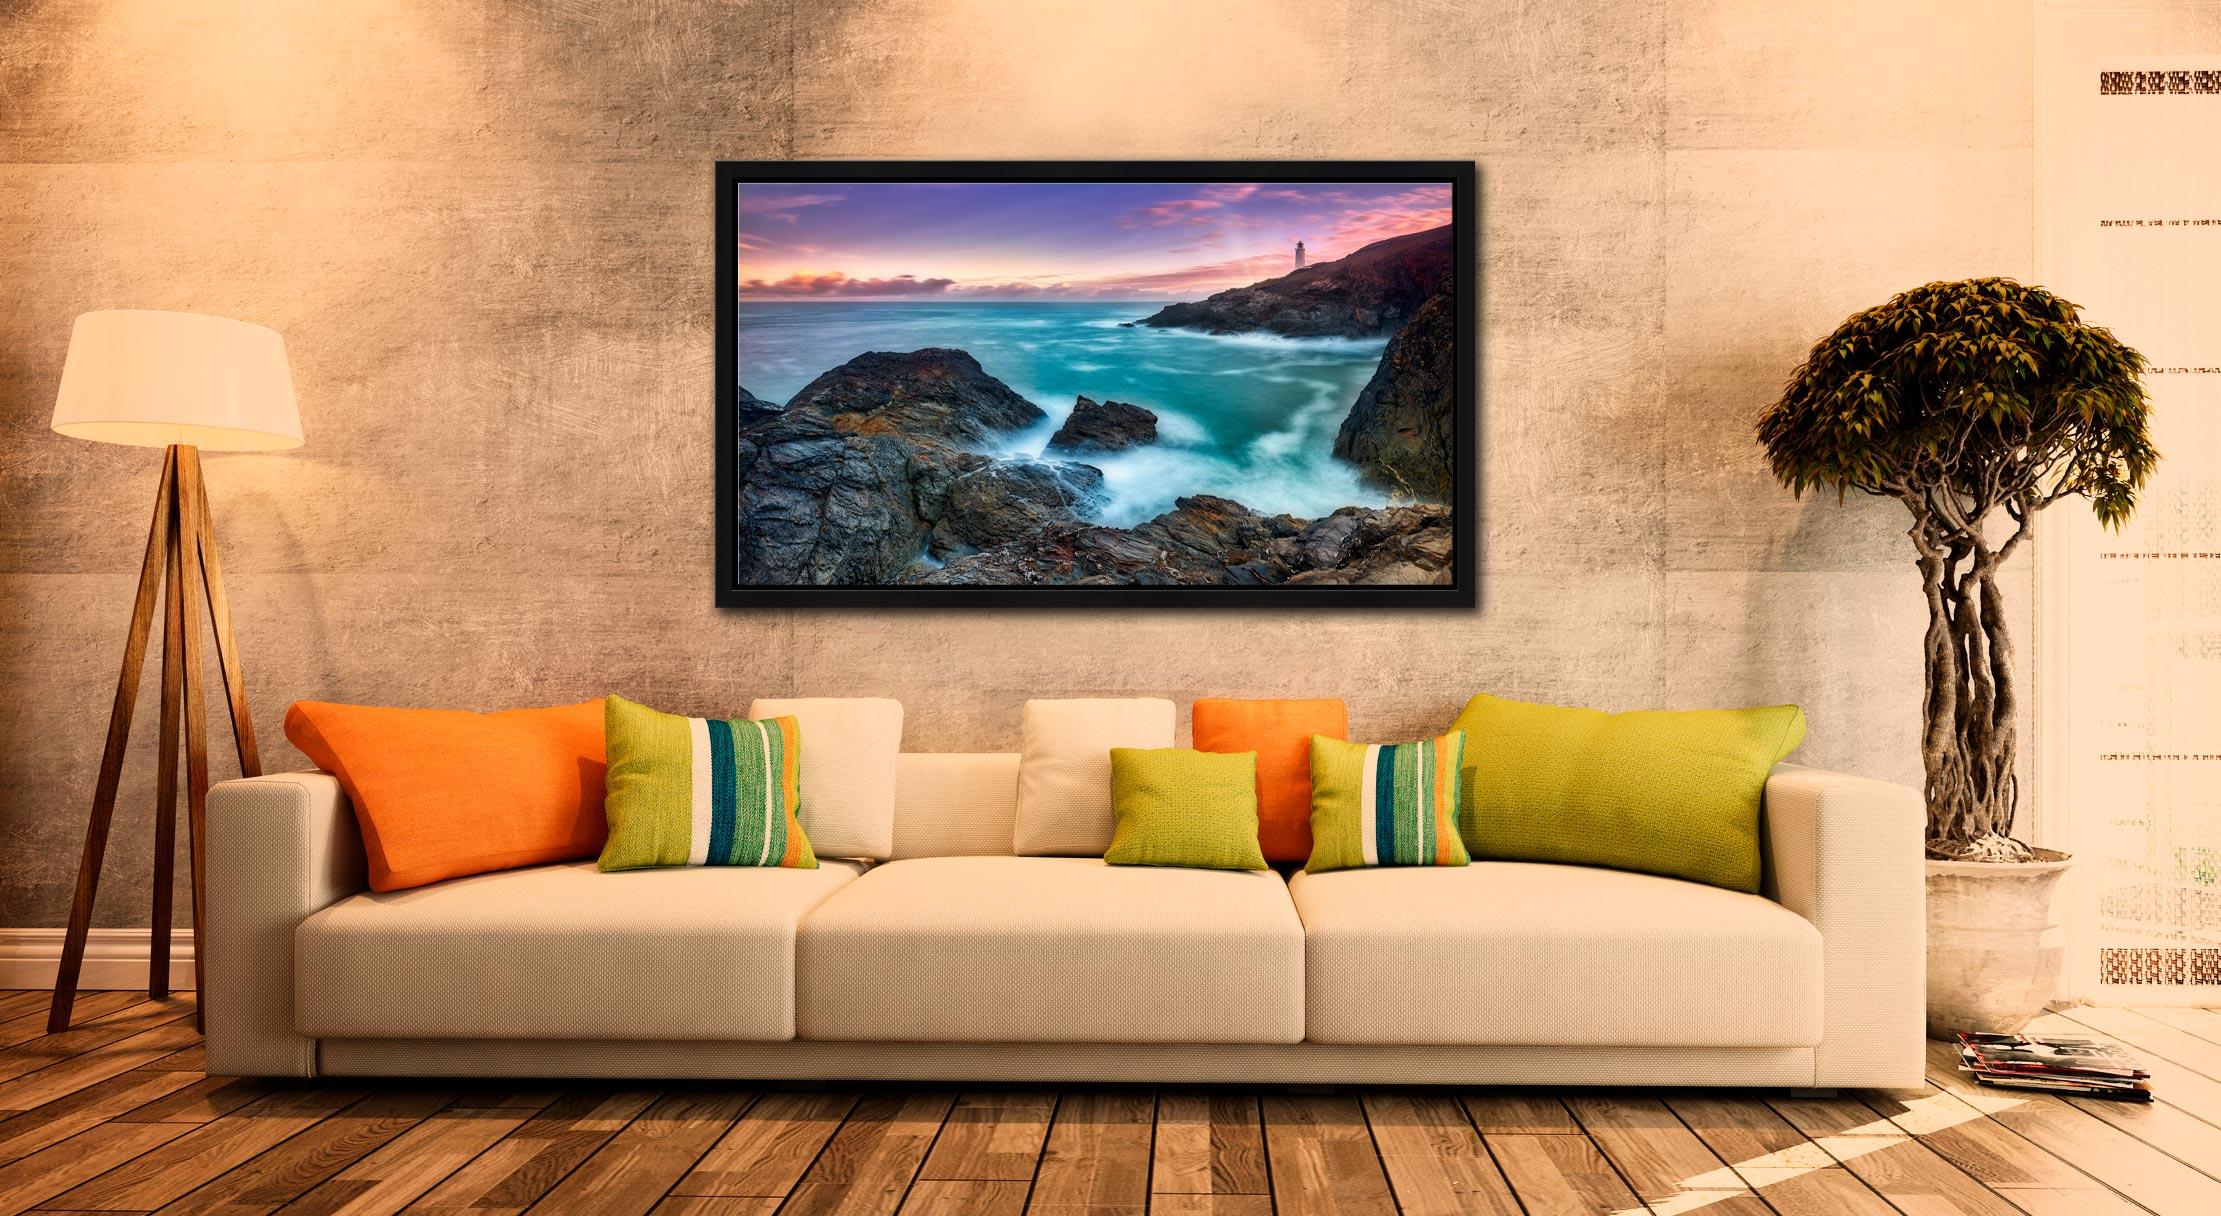 Stinking Cove Trevose Head Sunrise - Black oak floater frame with acrylic glazing on Wall